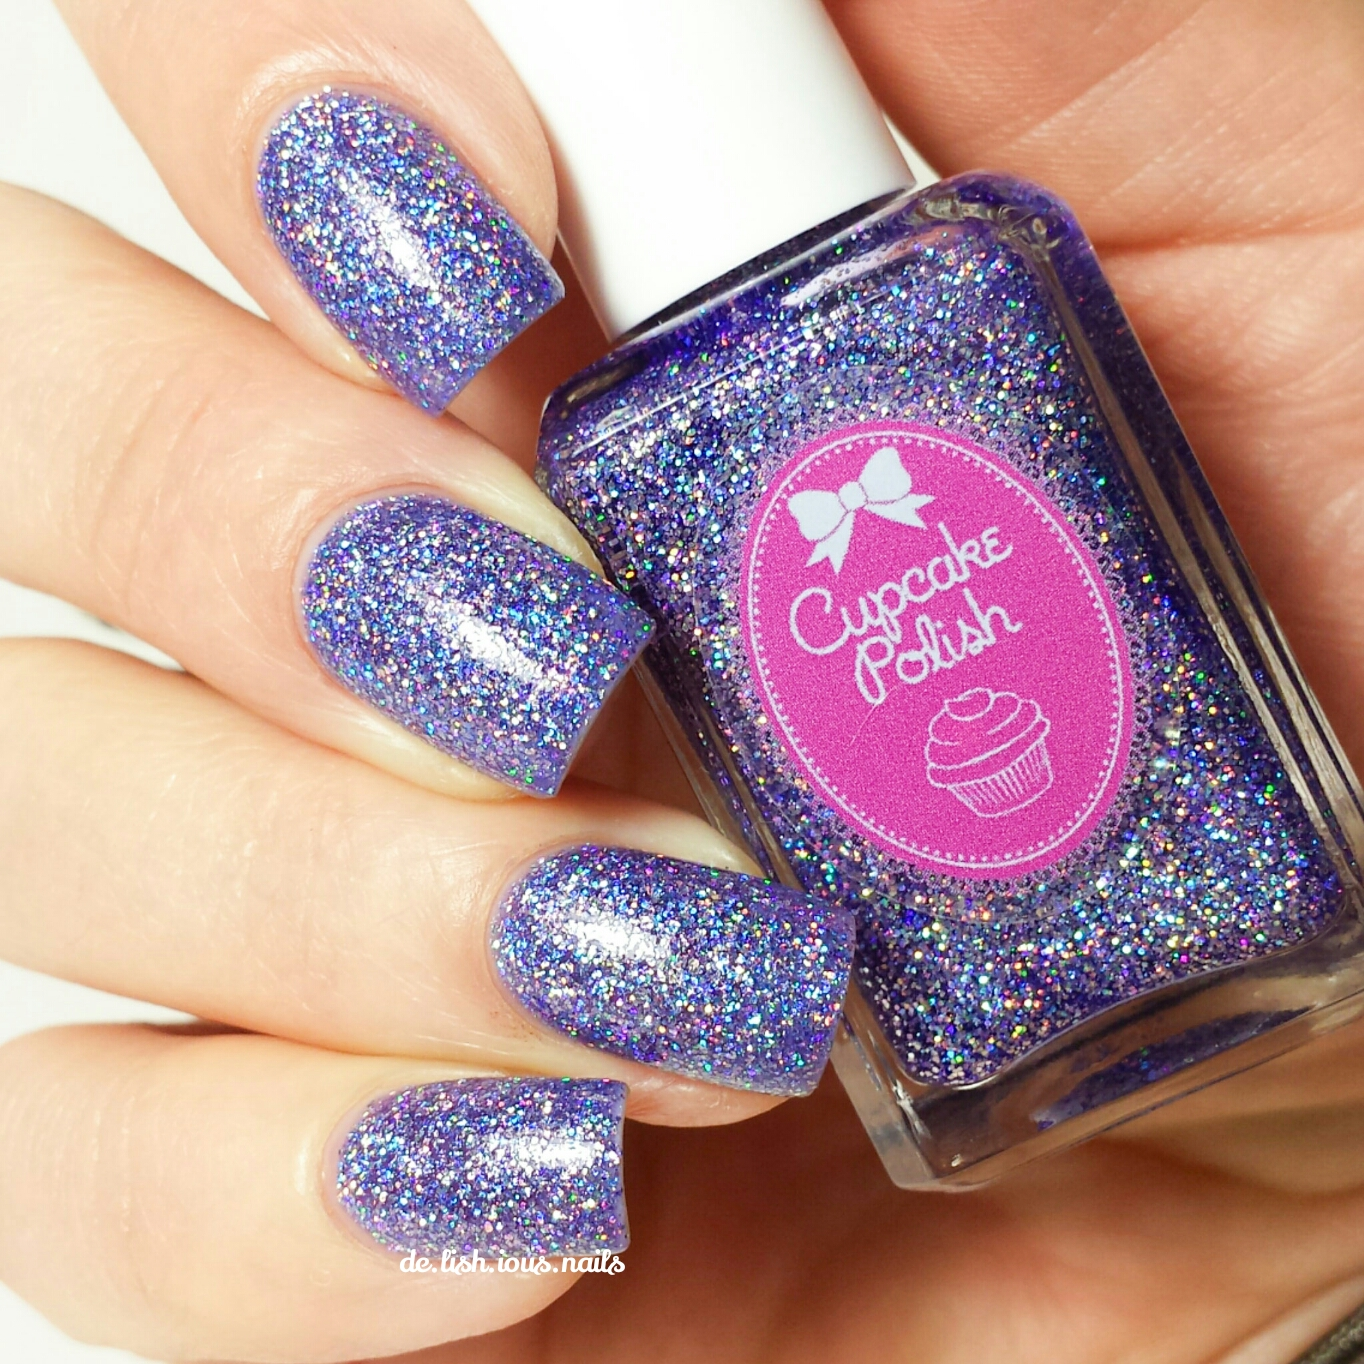 cupcake-polish-unicorn-believe-2.jpg.jpeg